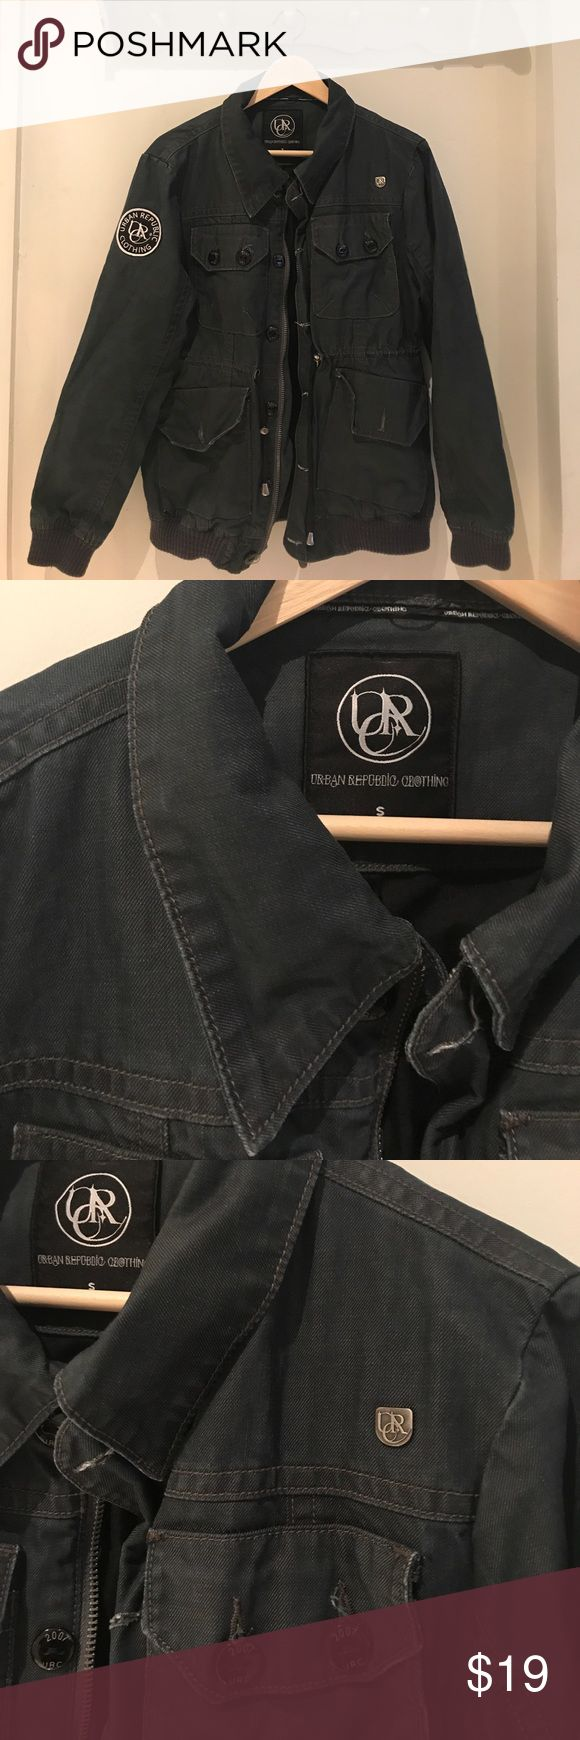 Man Jean jacket Good condition Urban Republic Jackets & Coats